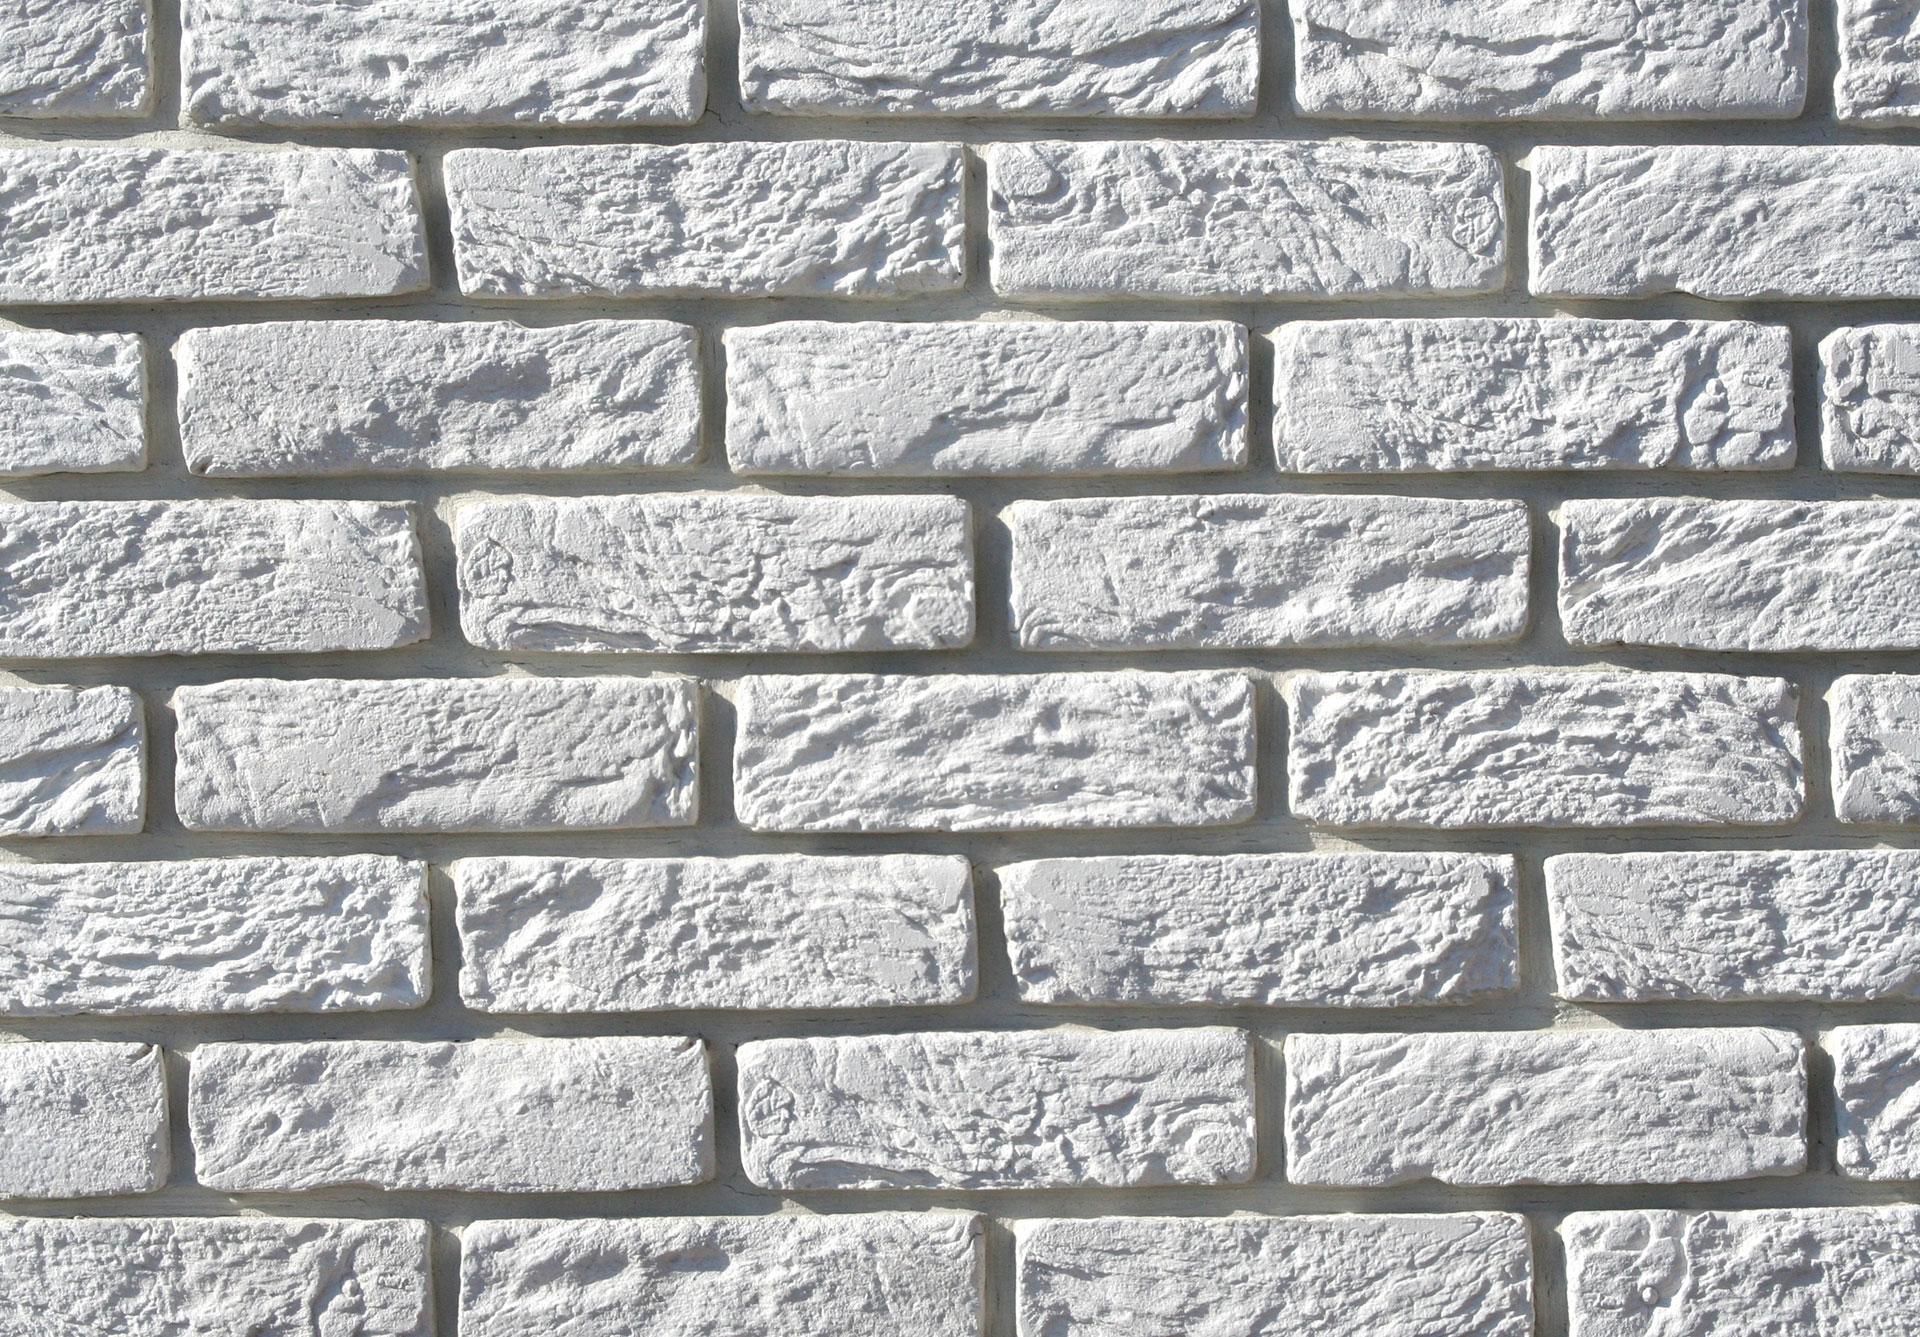 Magicrete Umělý kámen ANDORRA 210 x 60 – 65 mm 280-295 × 60-65 mm